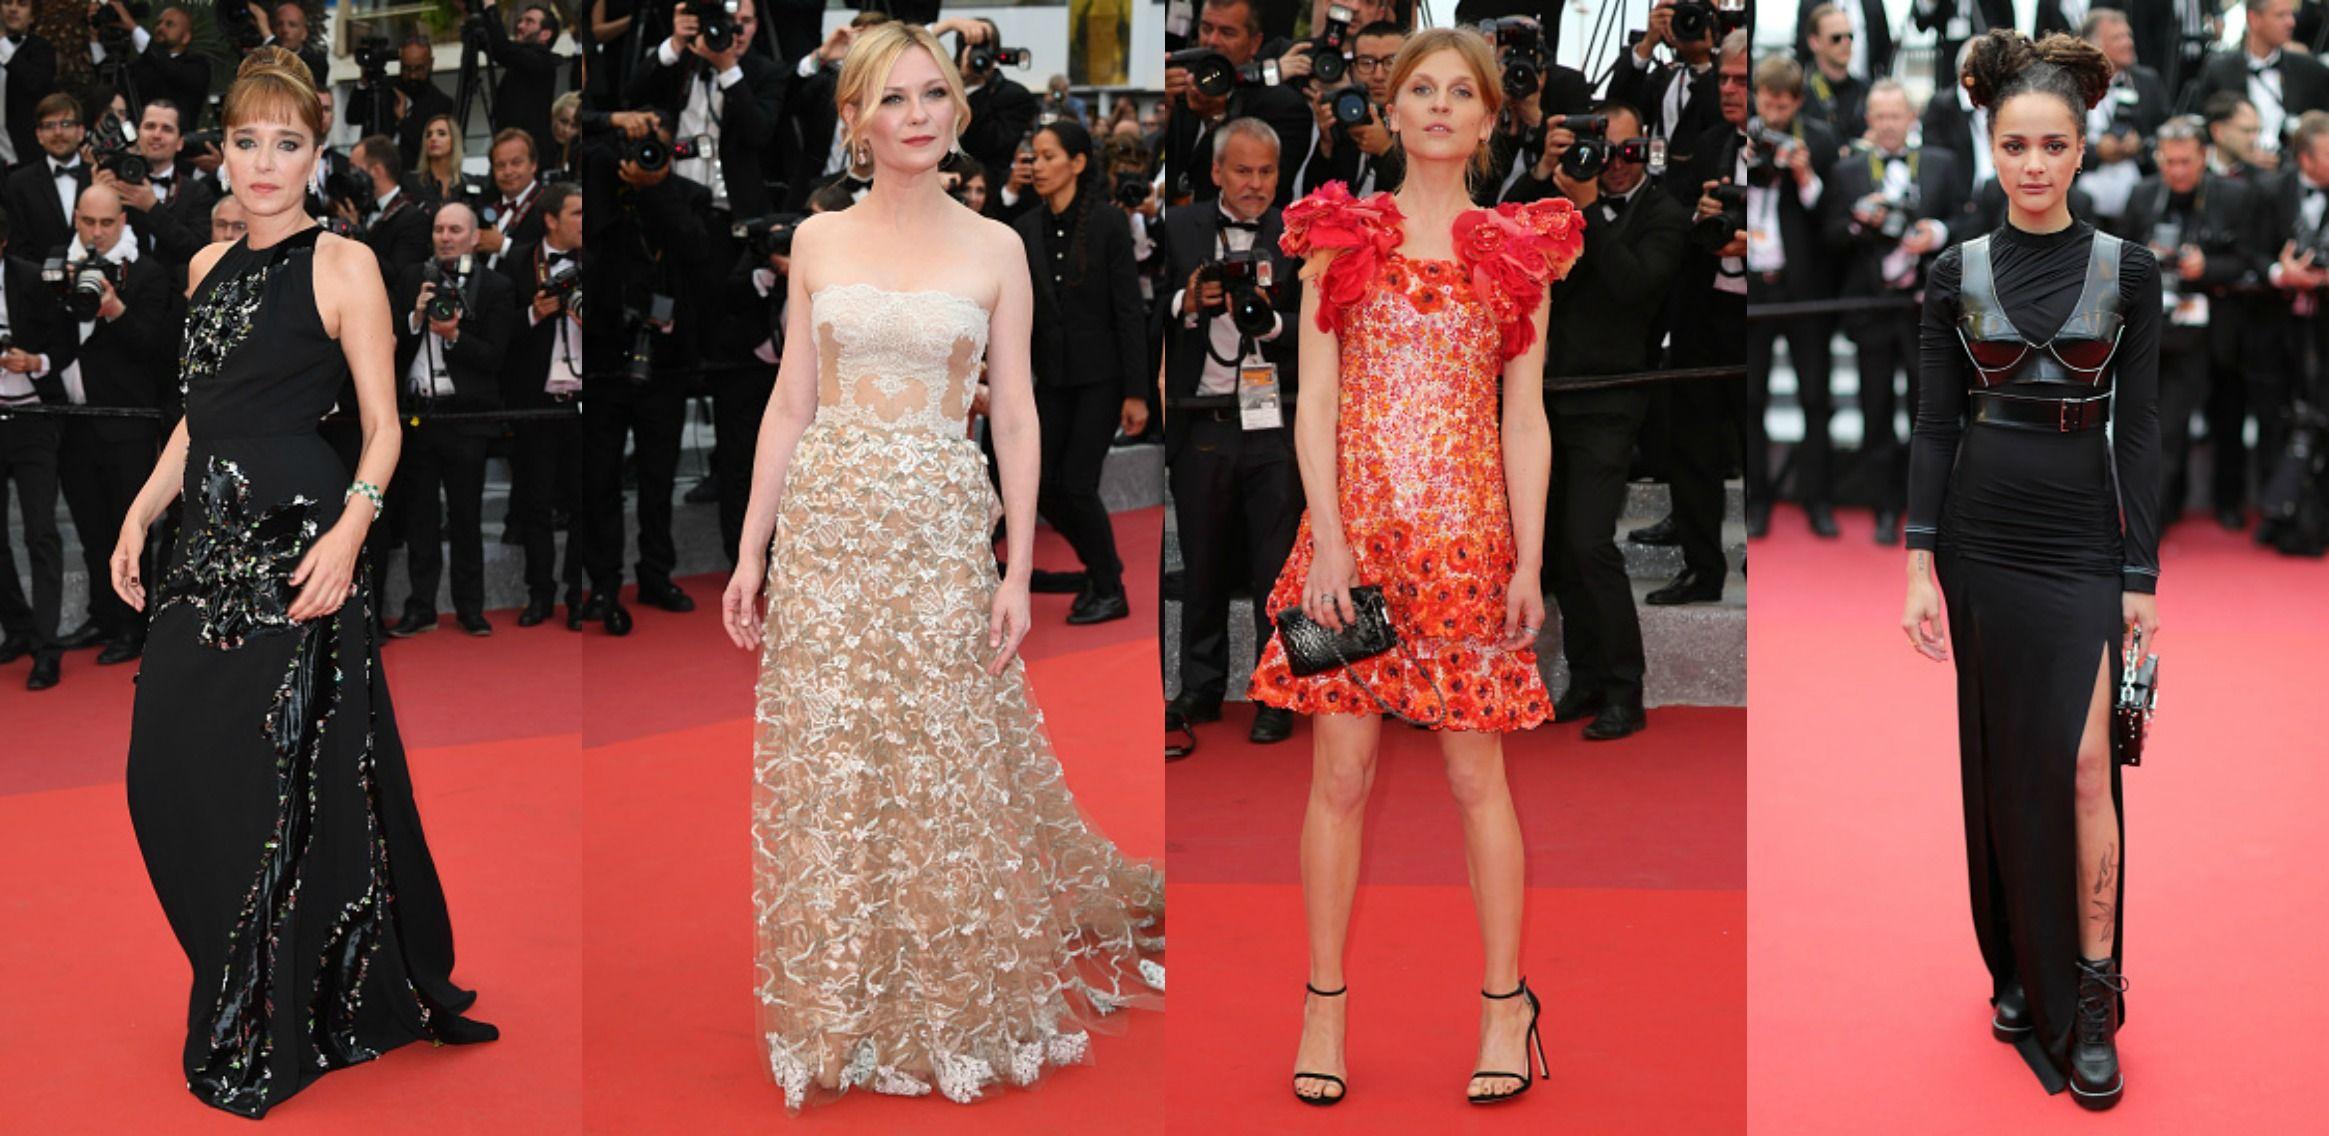 ed981bb8ad21 ... red carpet 02bf04ab88e  Cannes 2016 4f3bf99f452 ...